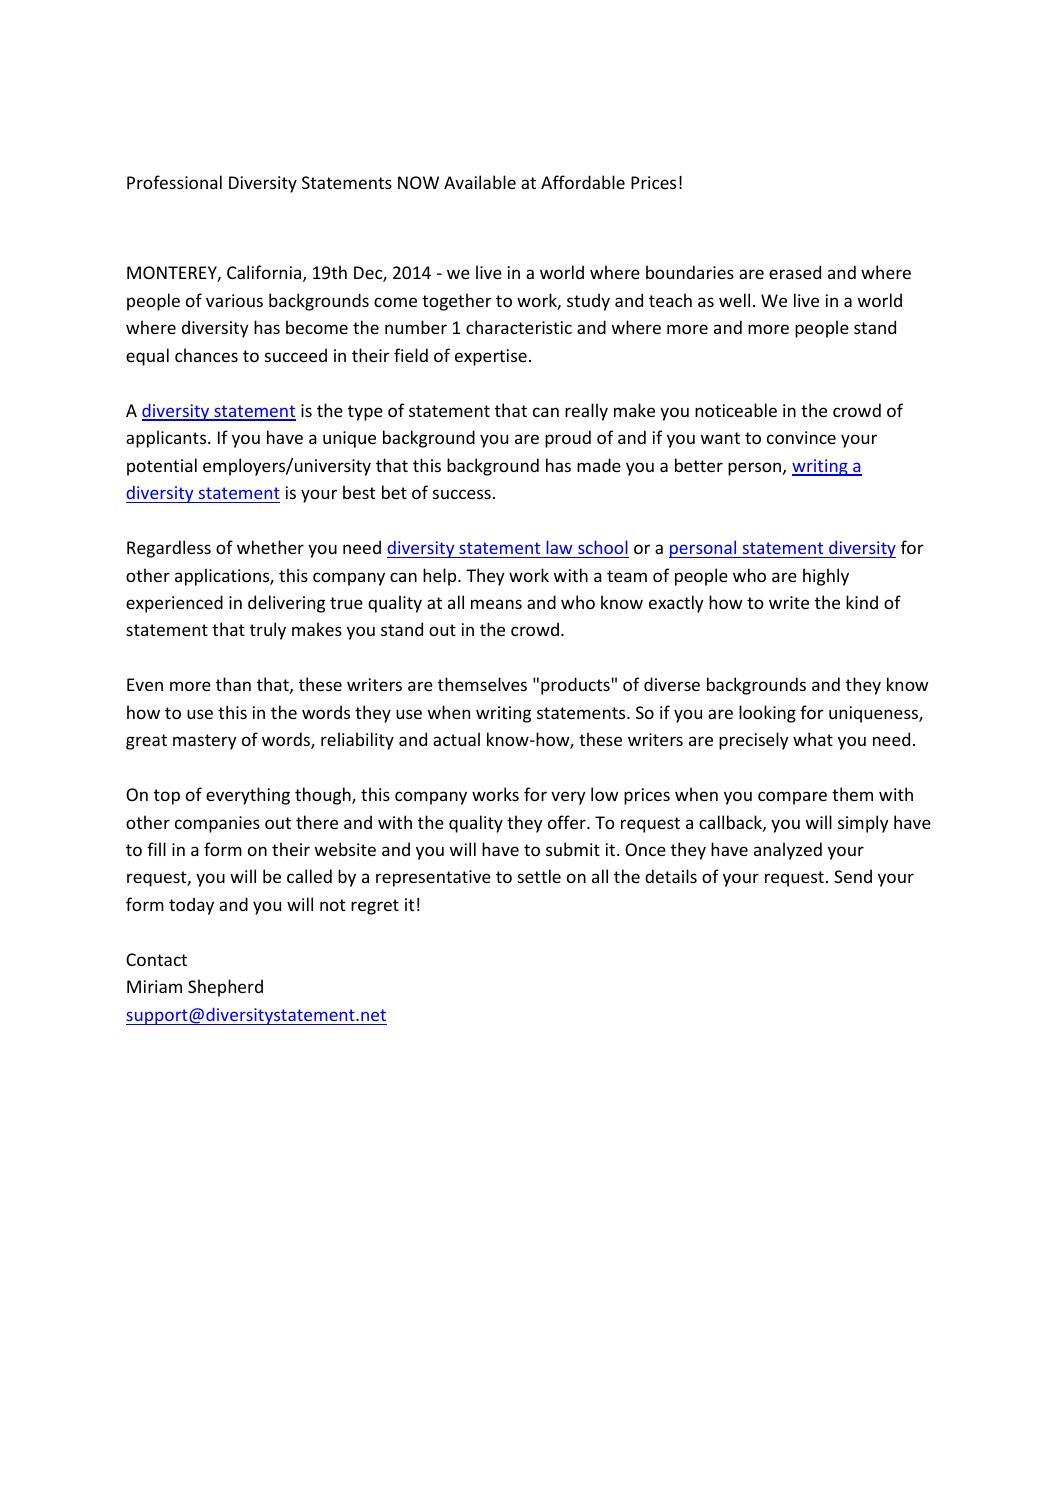 top argumentative essay writing sites for university